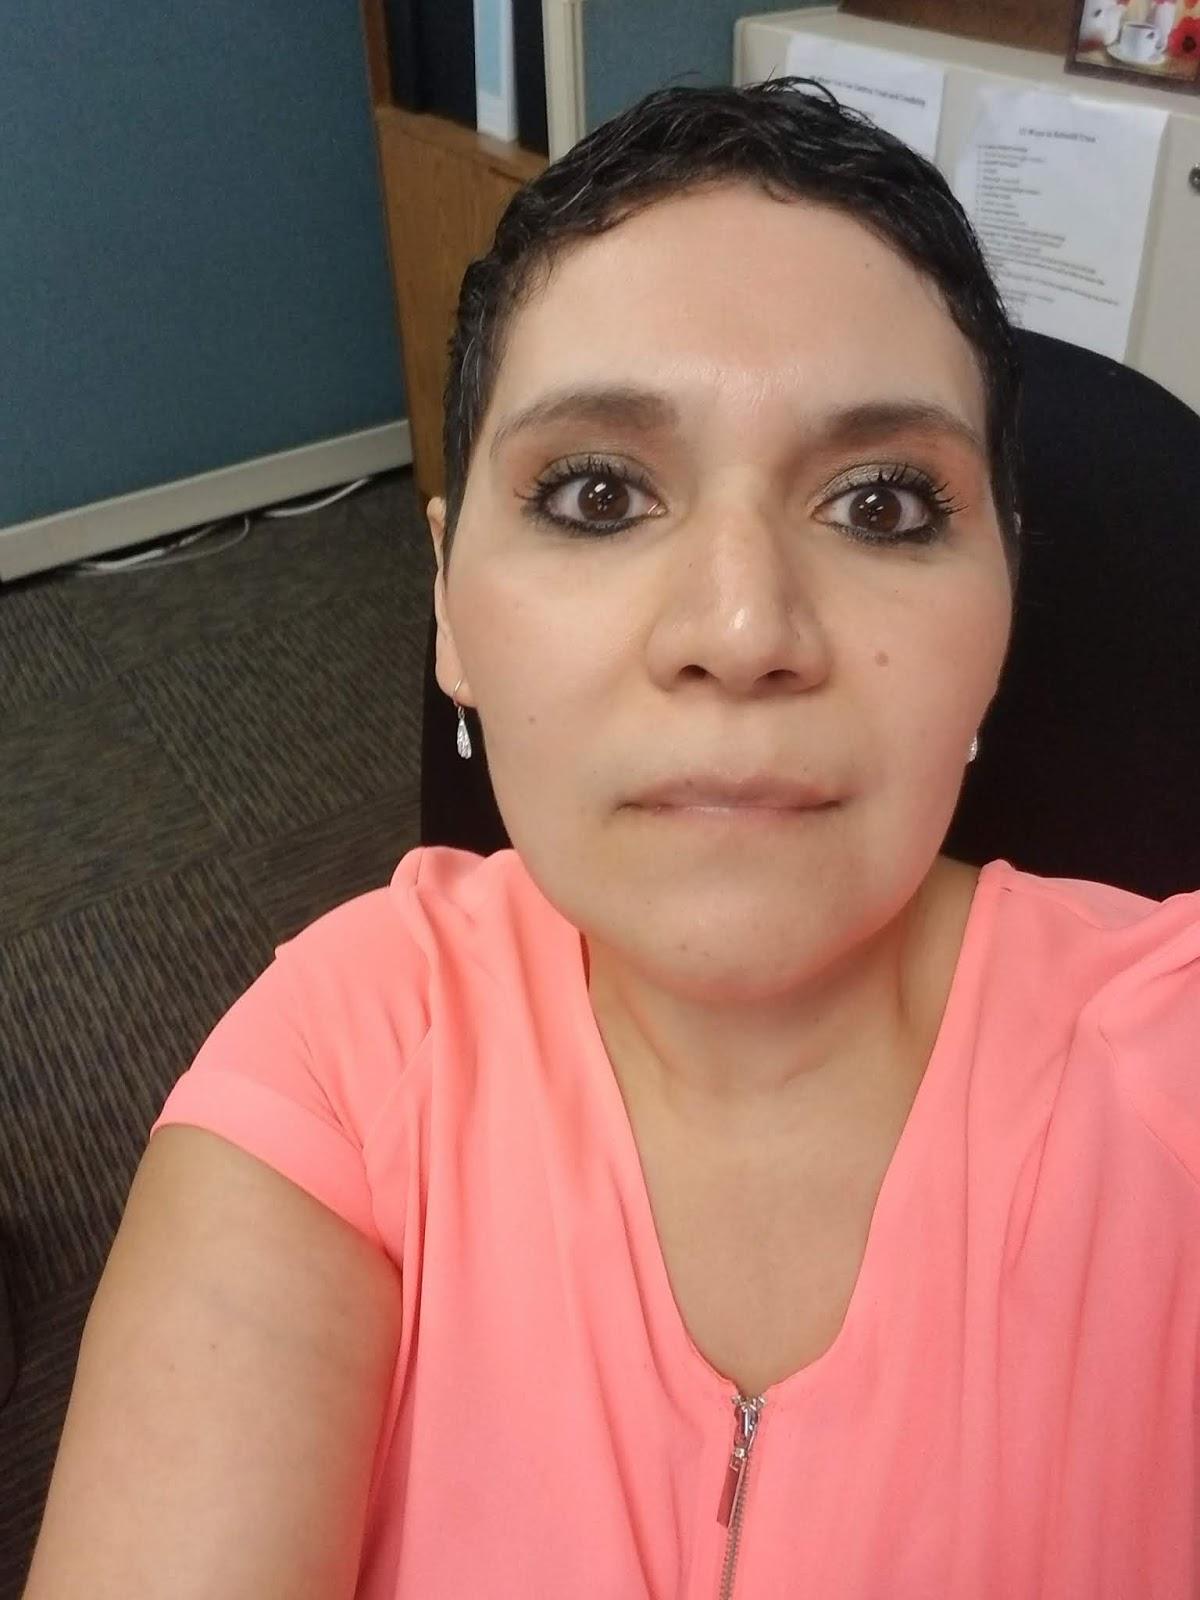 Ataxia Profile: Rosie Ruiz